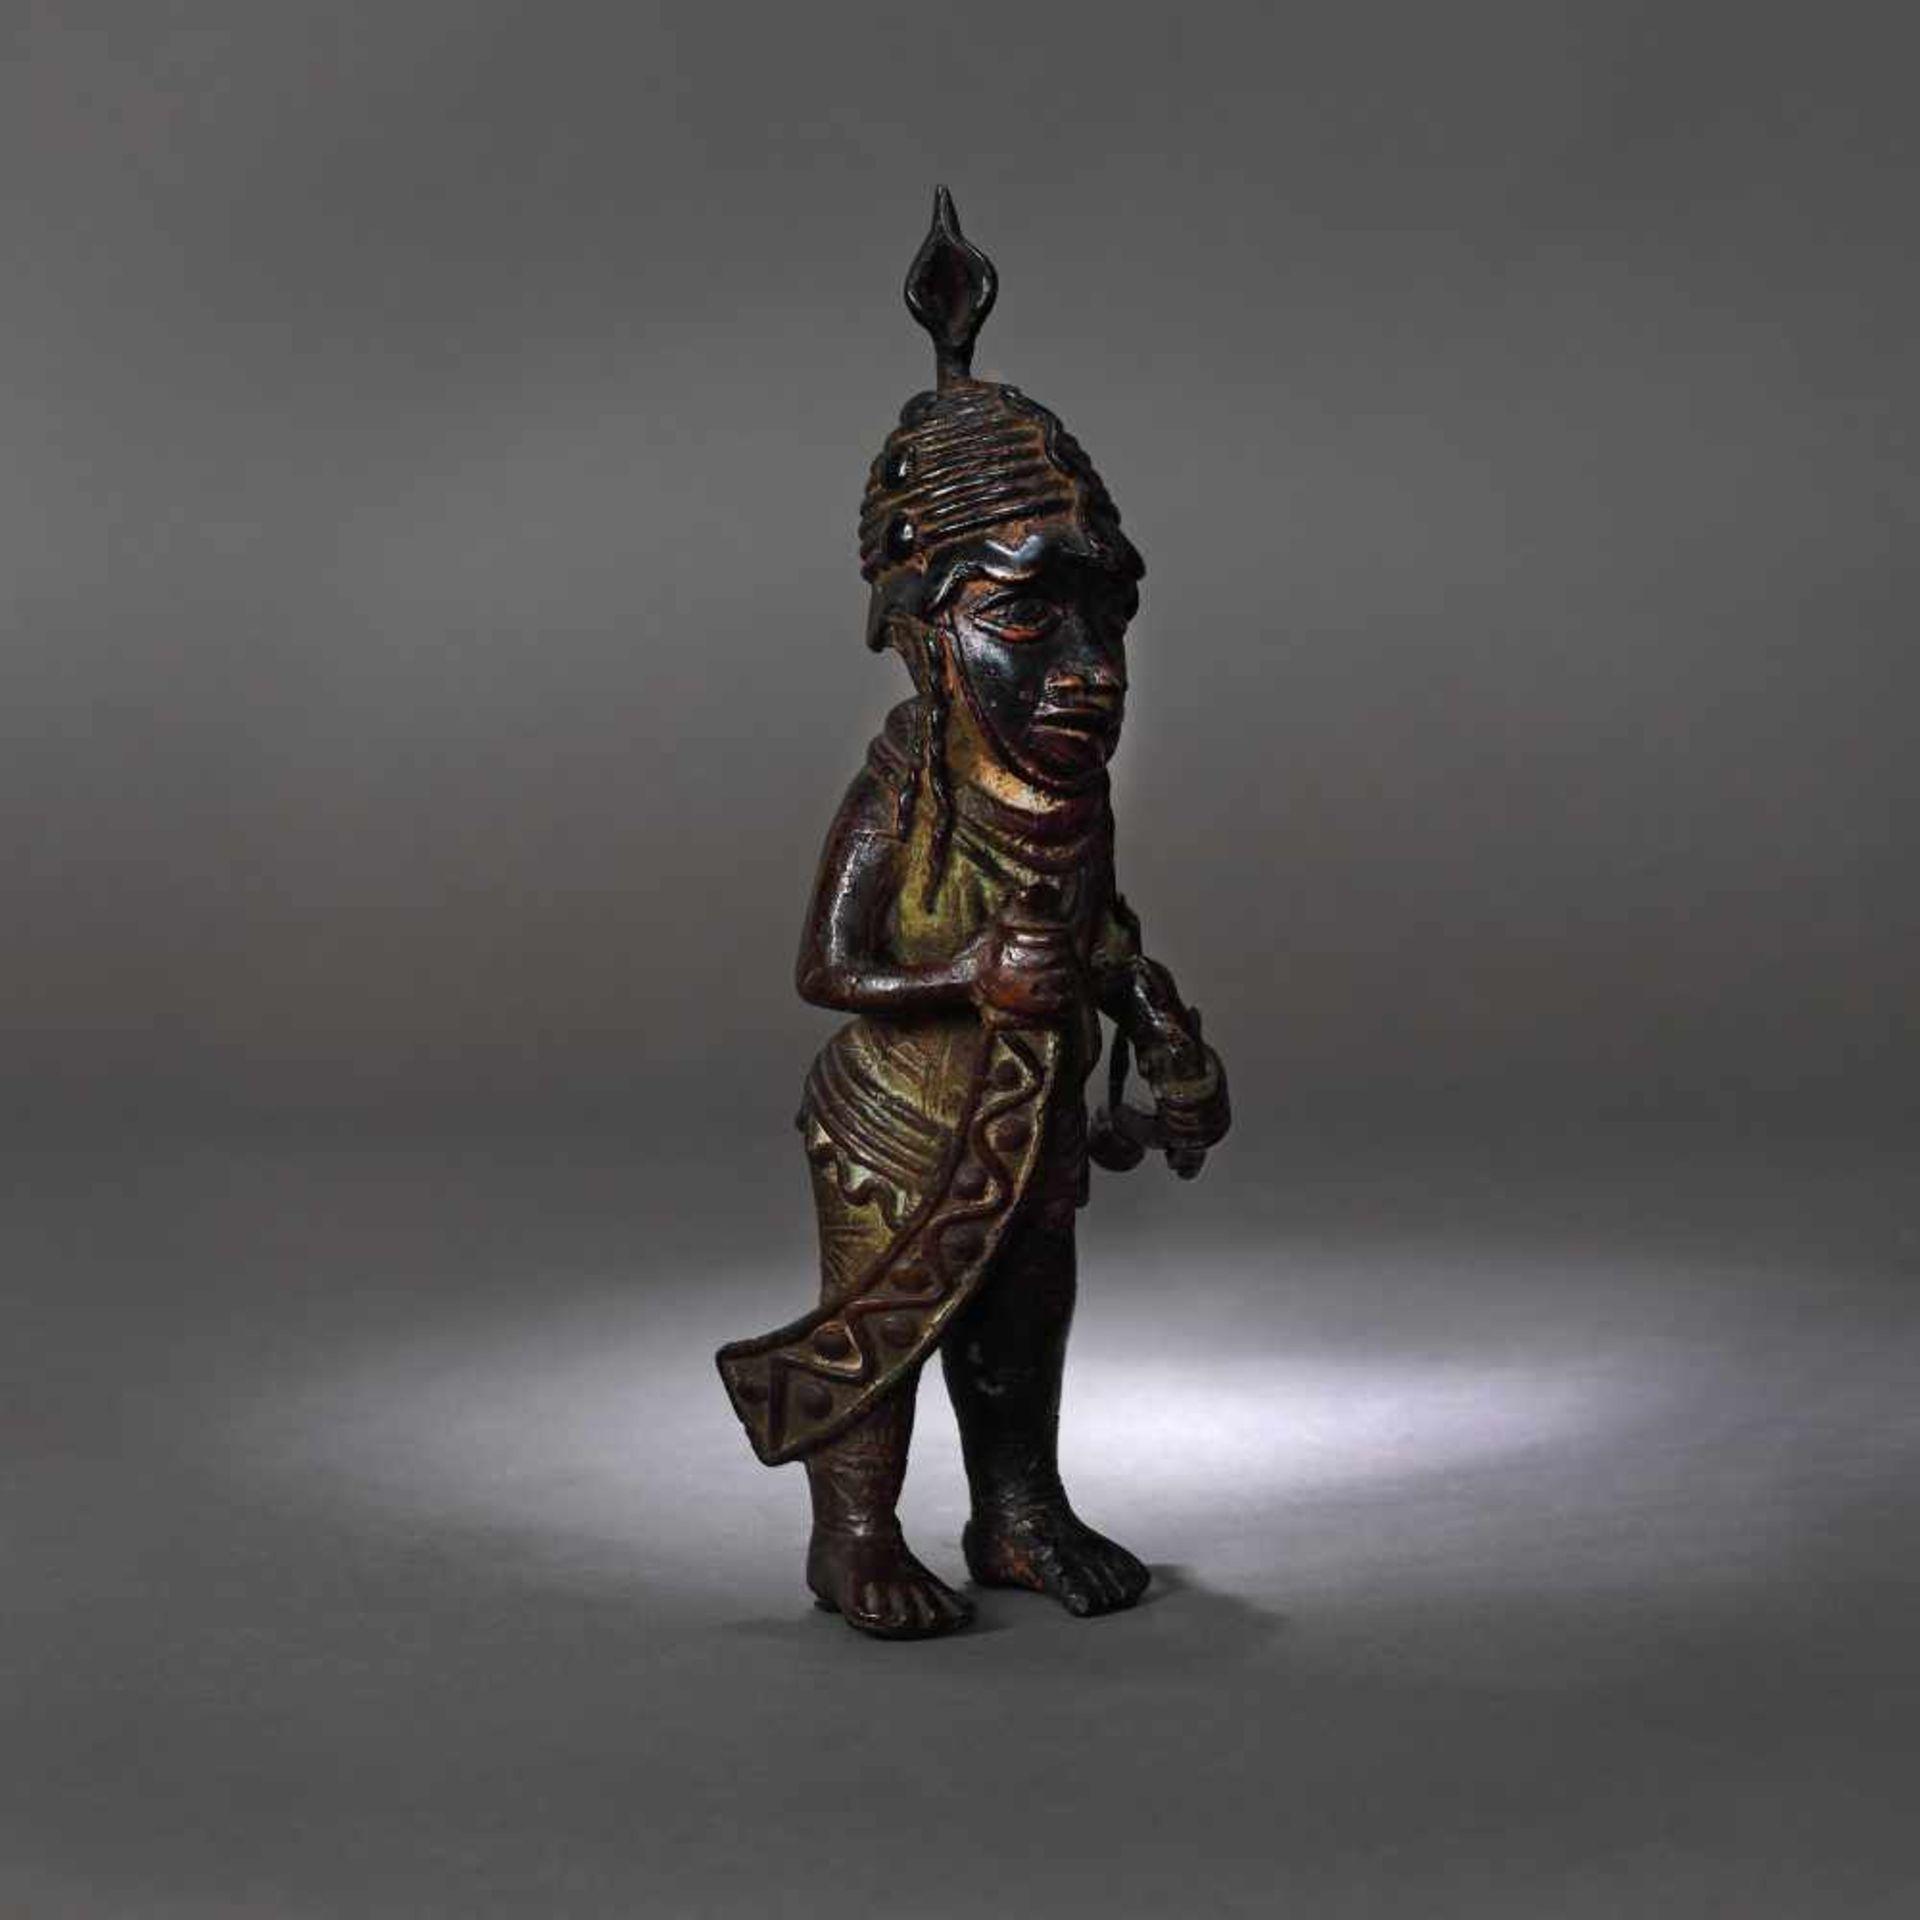 Bronze statuette, representing a warrior, possibly Nigeria, early 20th century - Bild 3 aus 4